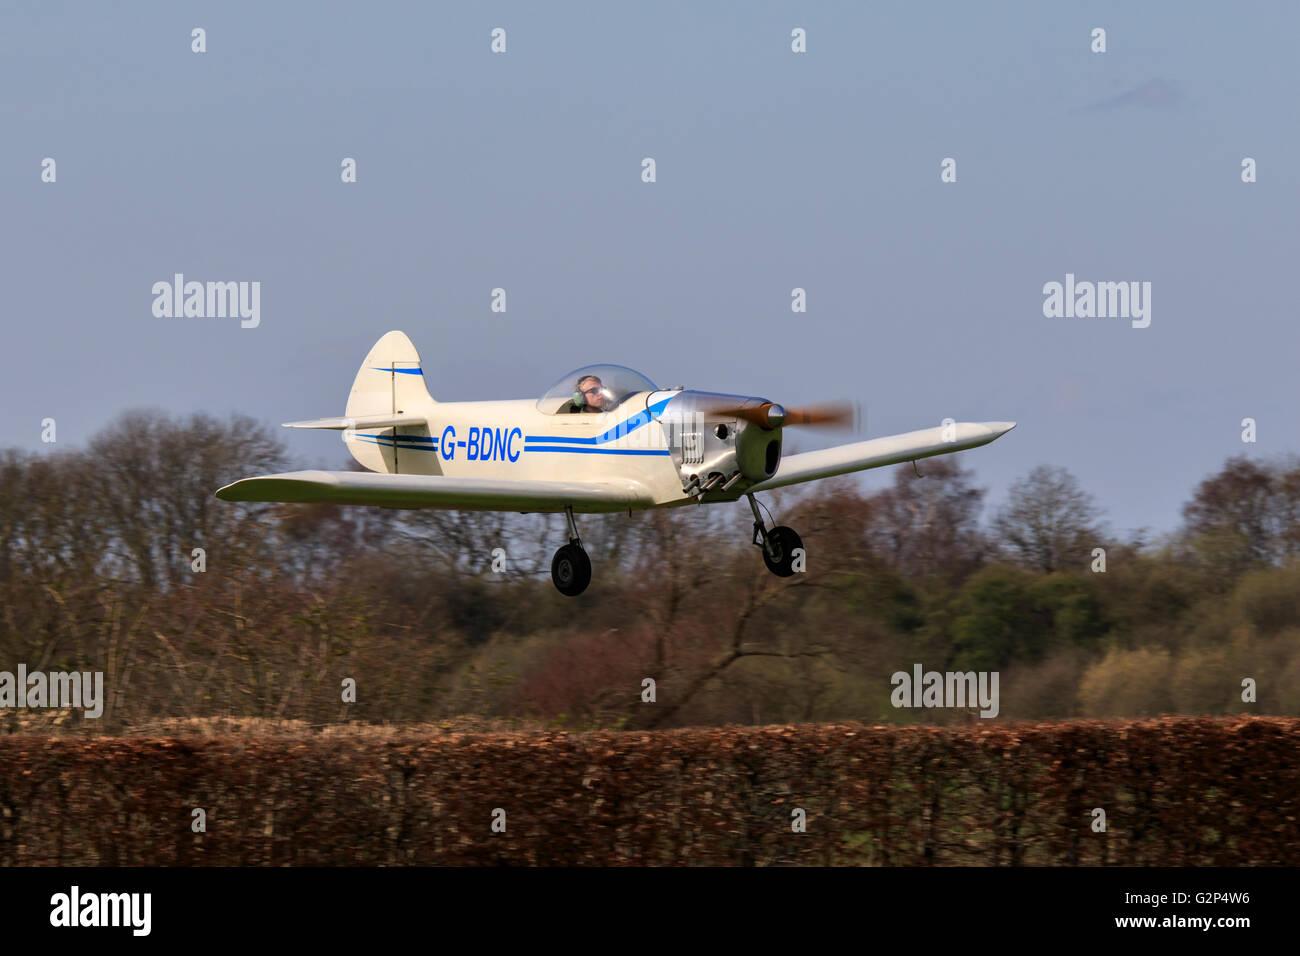 Taylor Monoplane G-BDNC landing at Breighton Airfield - Stock Image